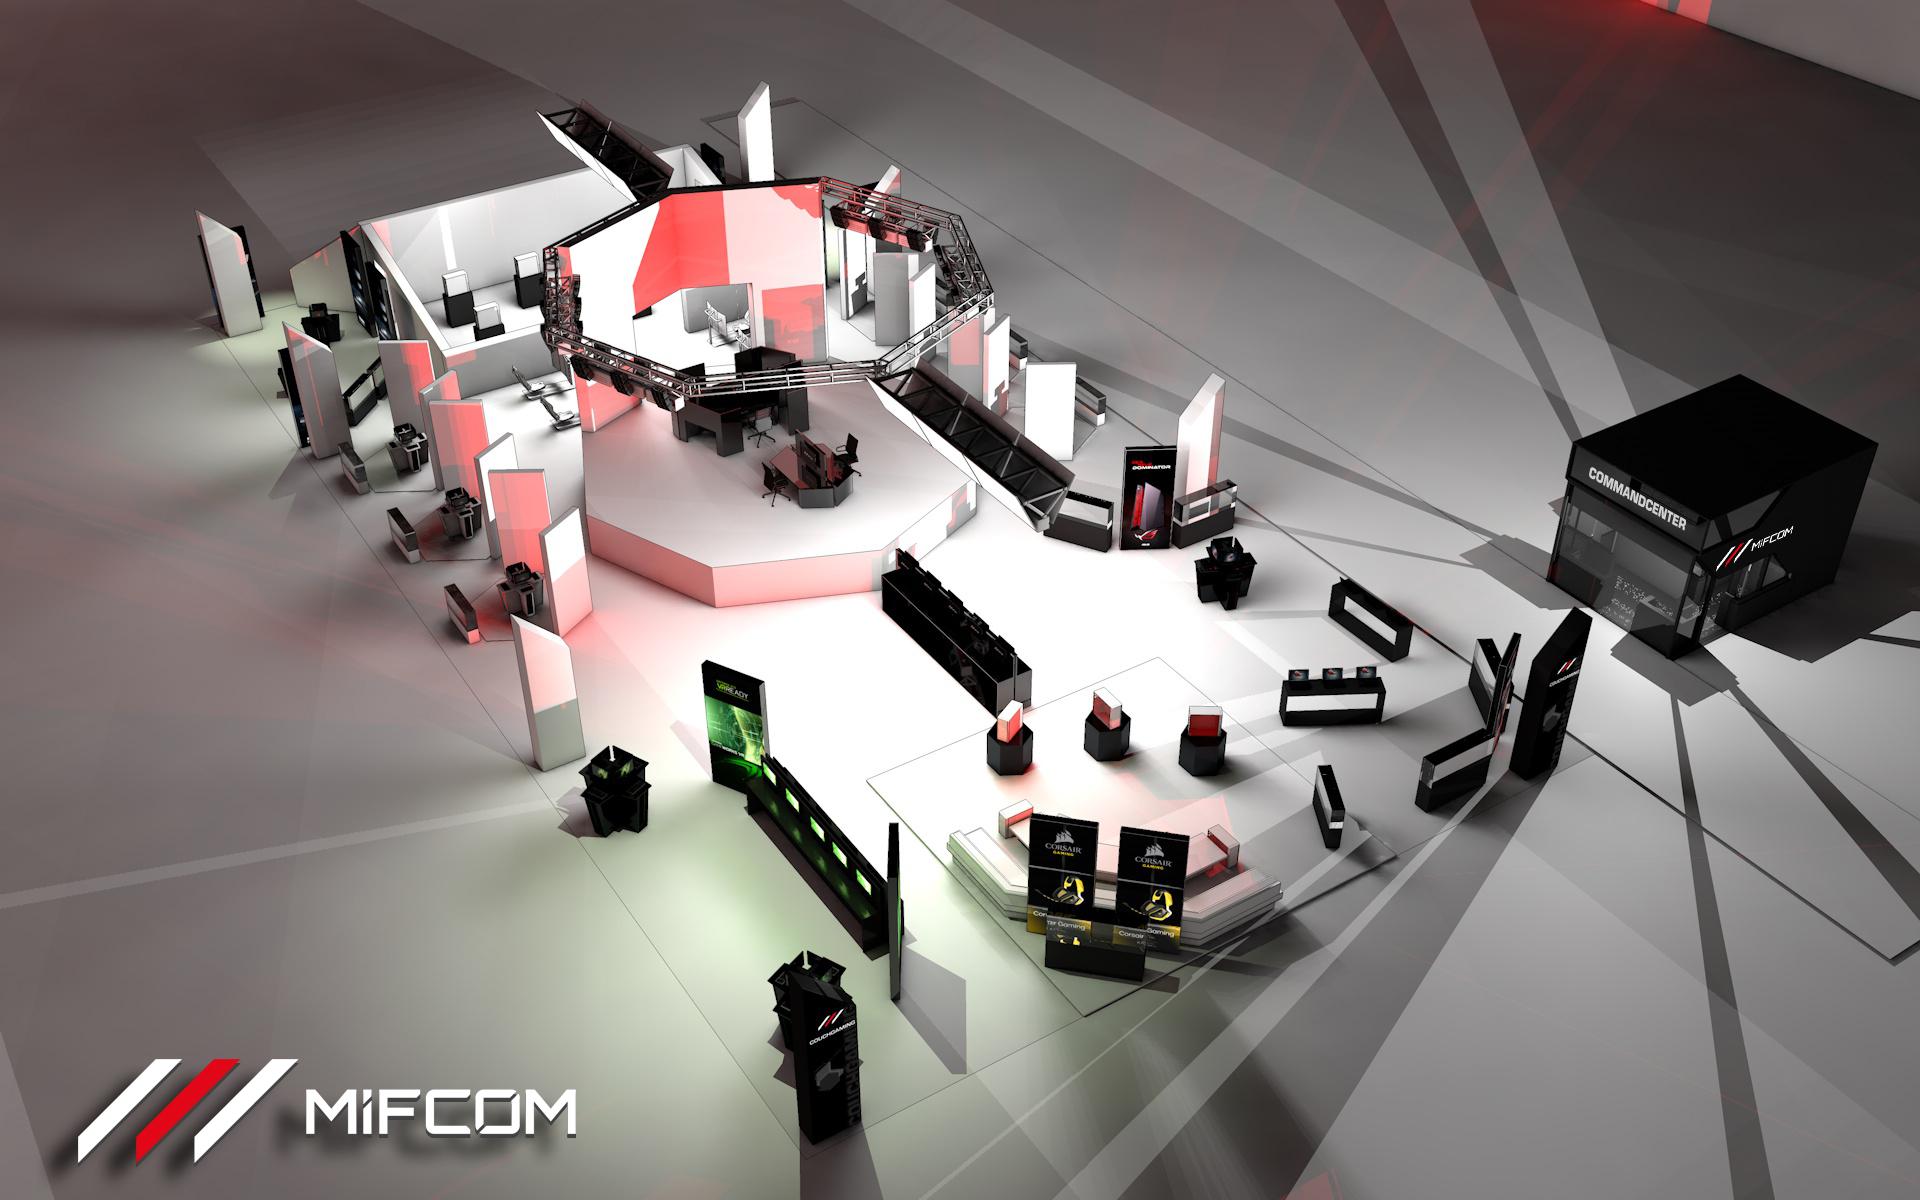 MifCom Messestand Idee und Umsetzung in 3D